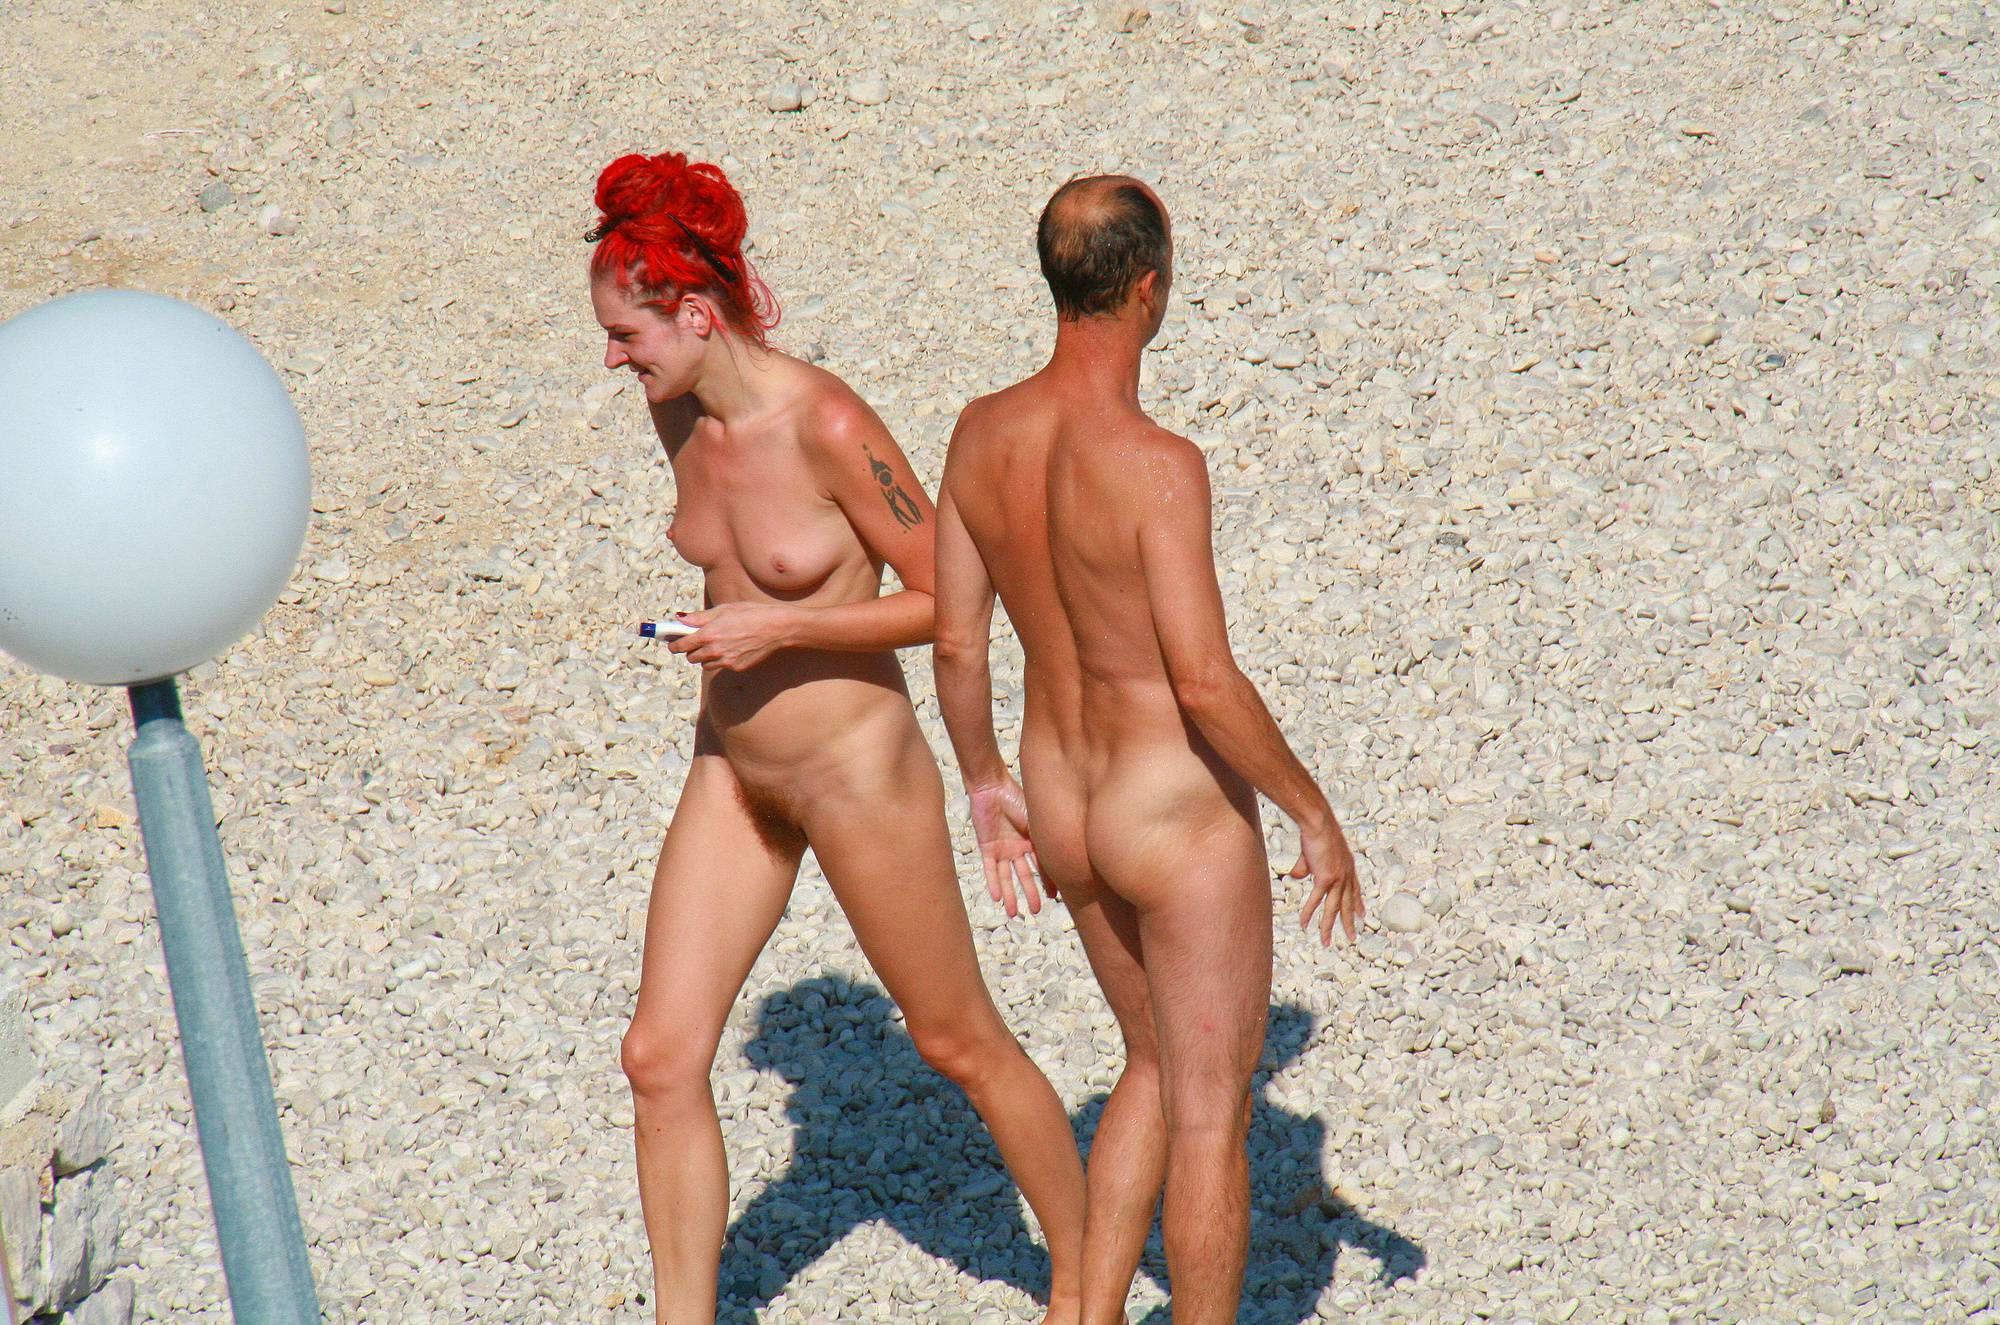 Nudist Photos Ula FKK Red Hairstyle Girl - 1